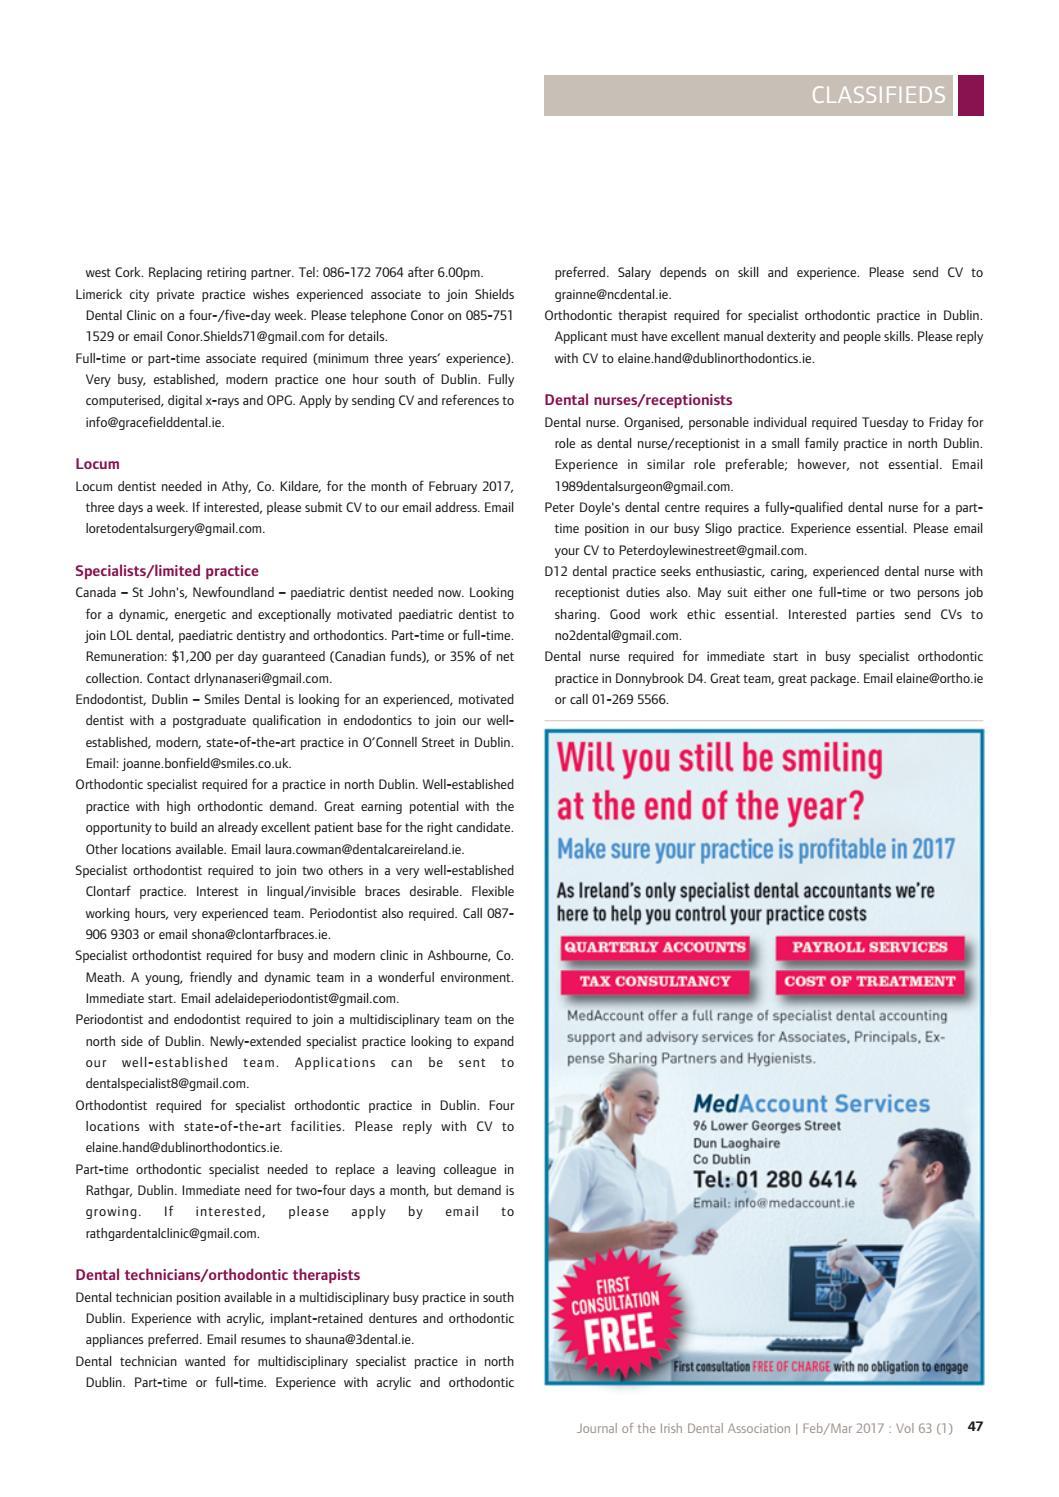 Journal of the Irish Dental Association non-members February